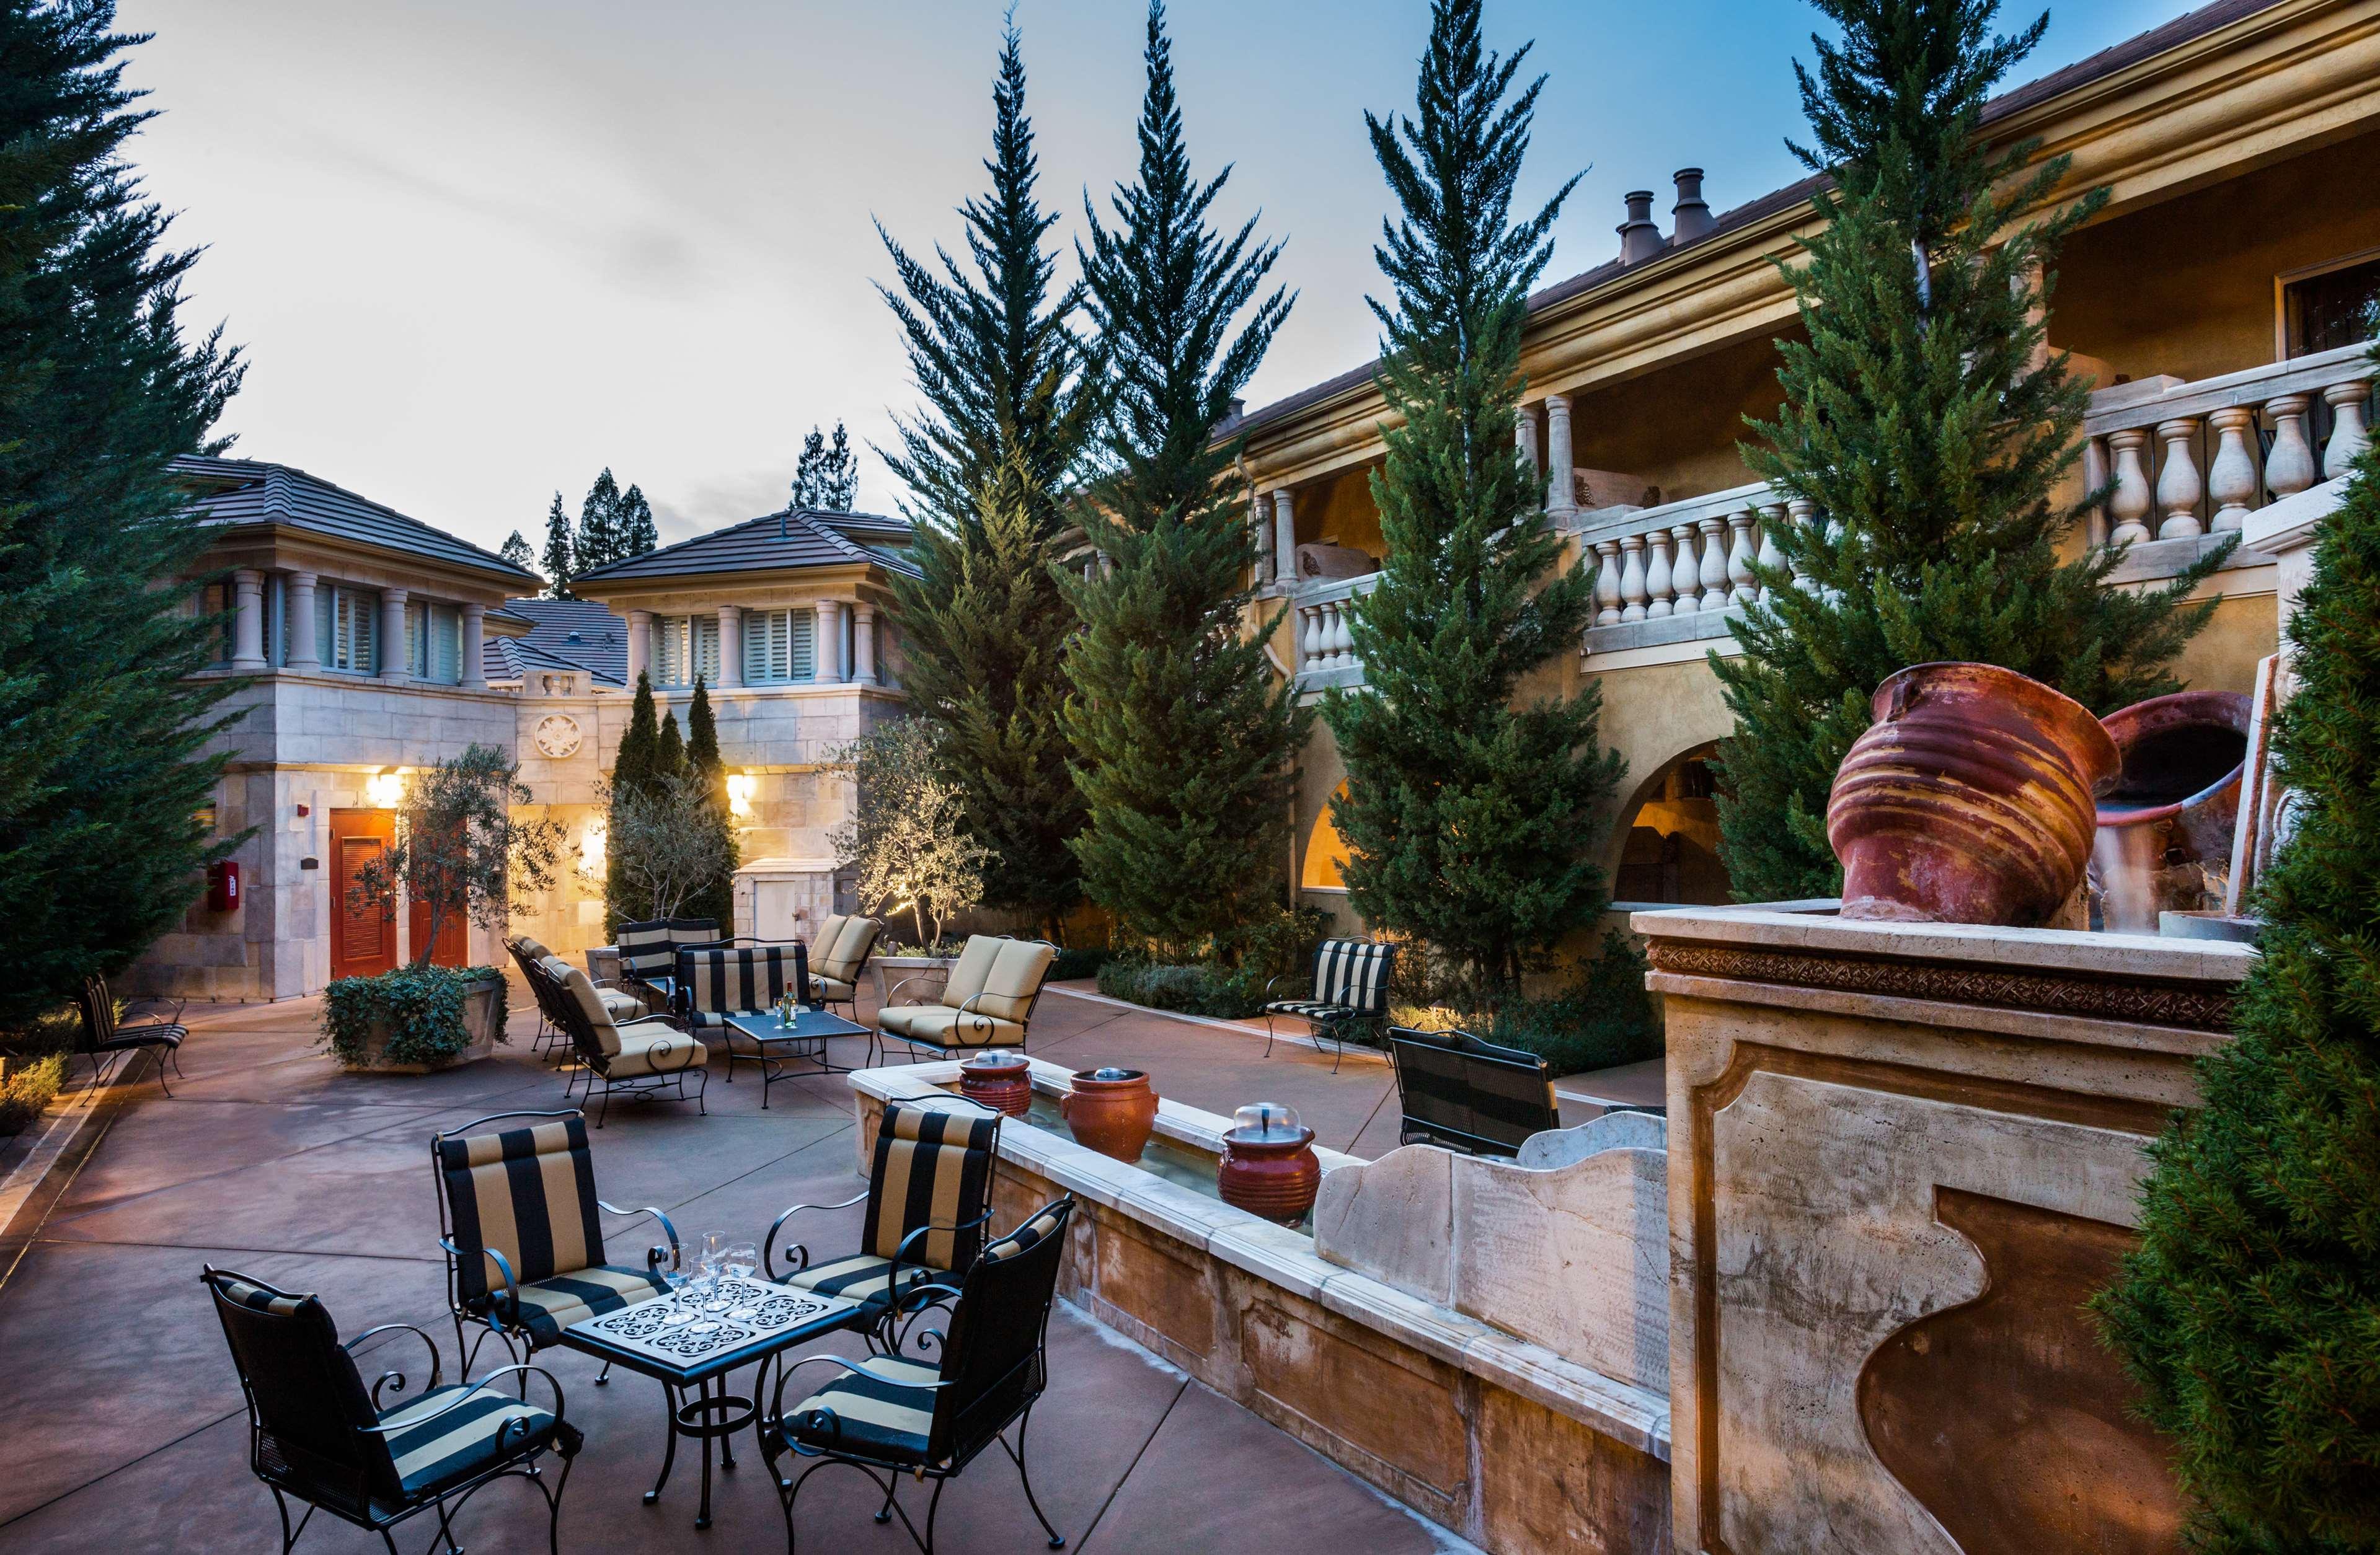 Best Western Hotel In Healdsburg California